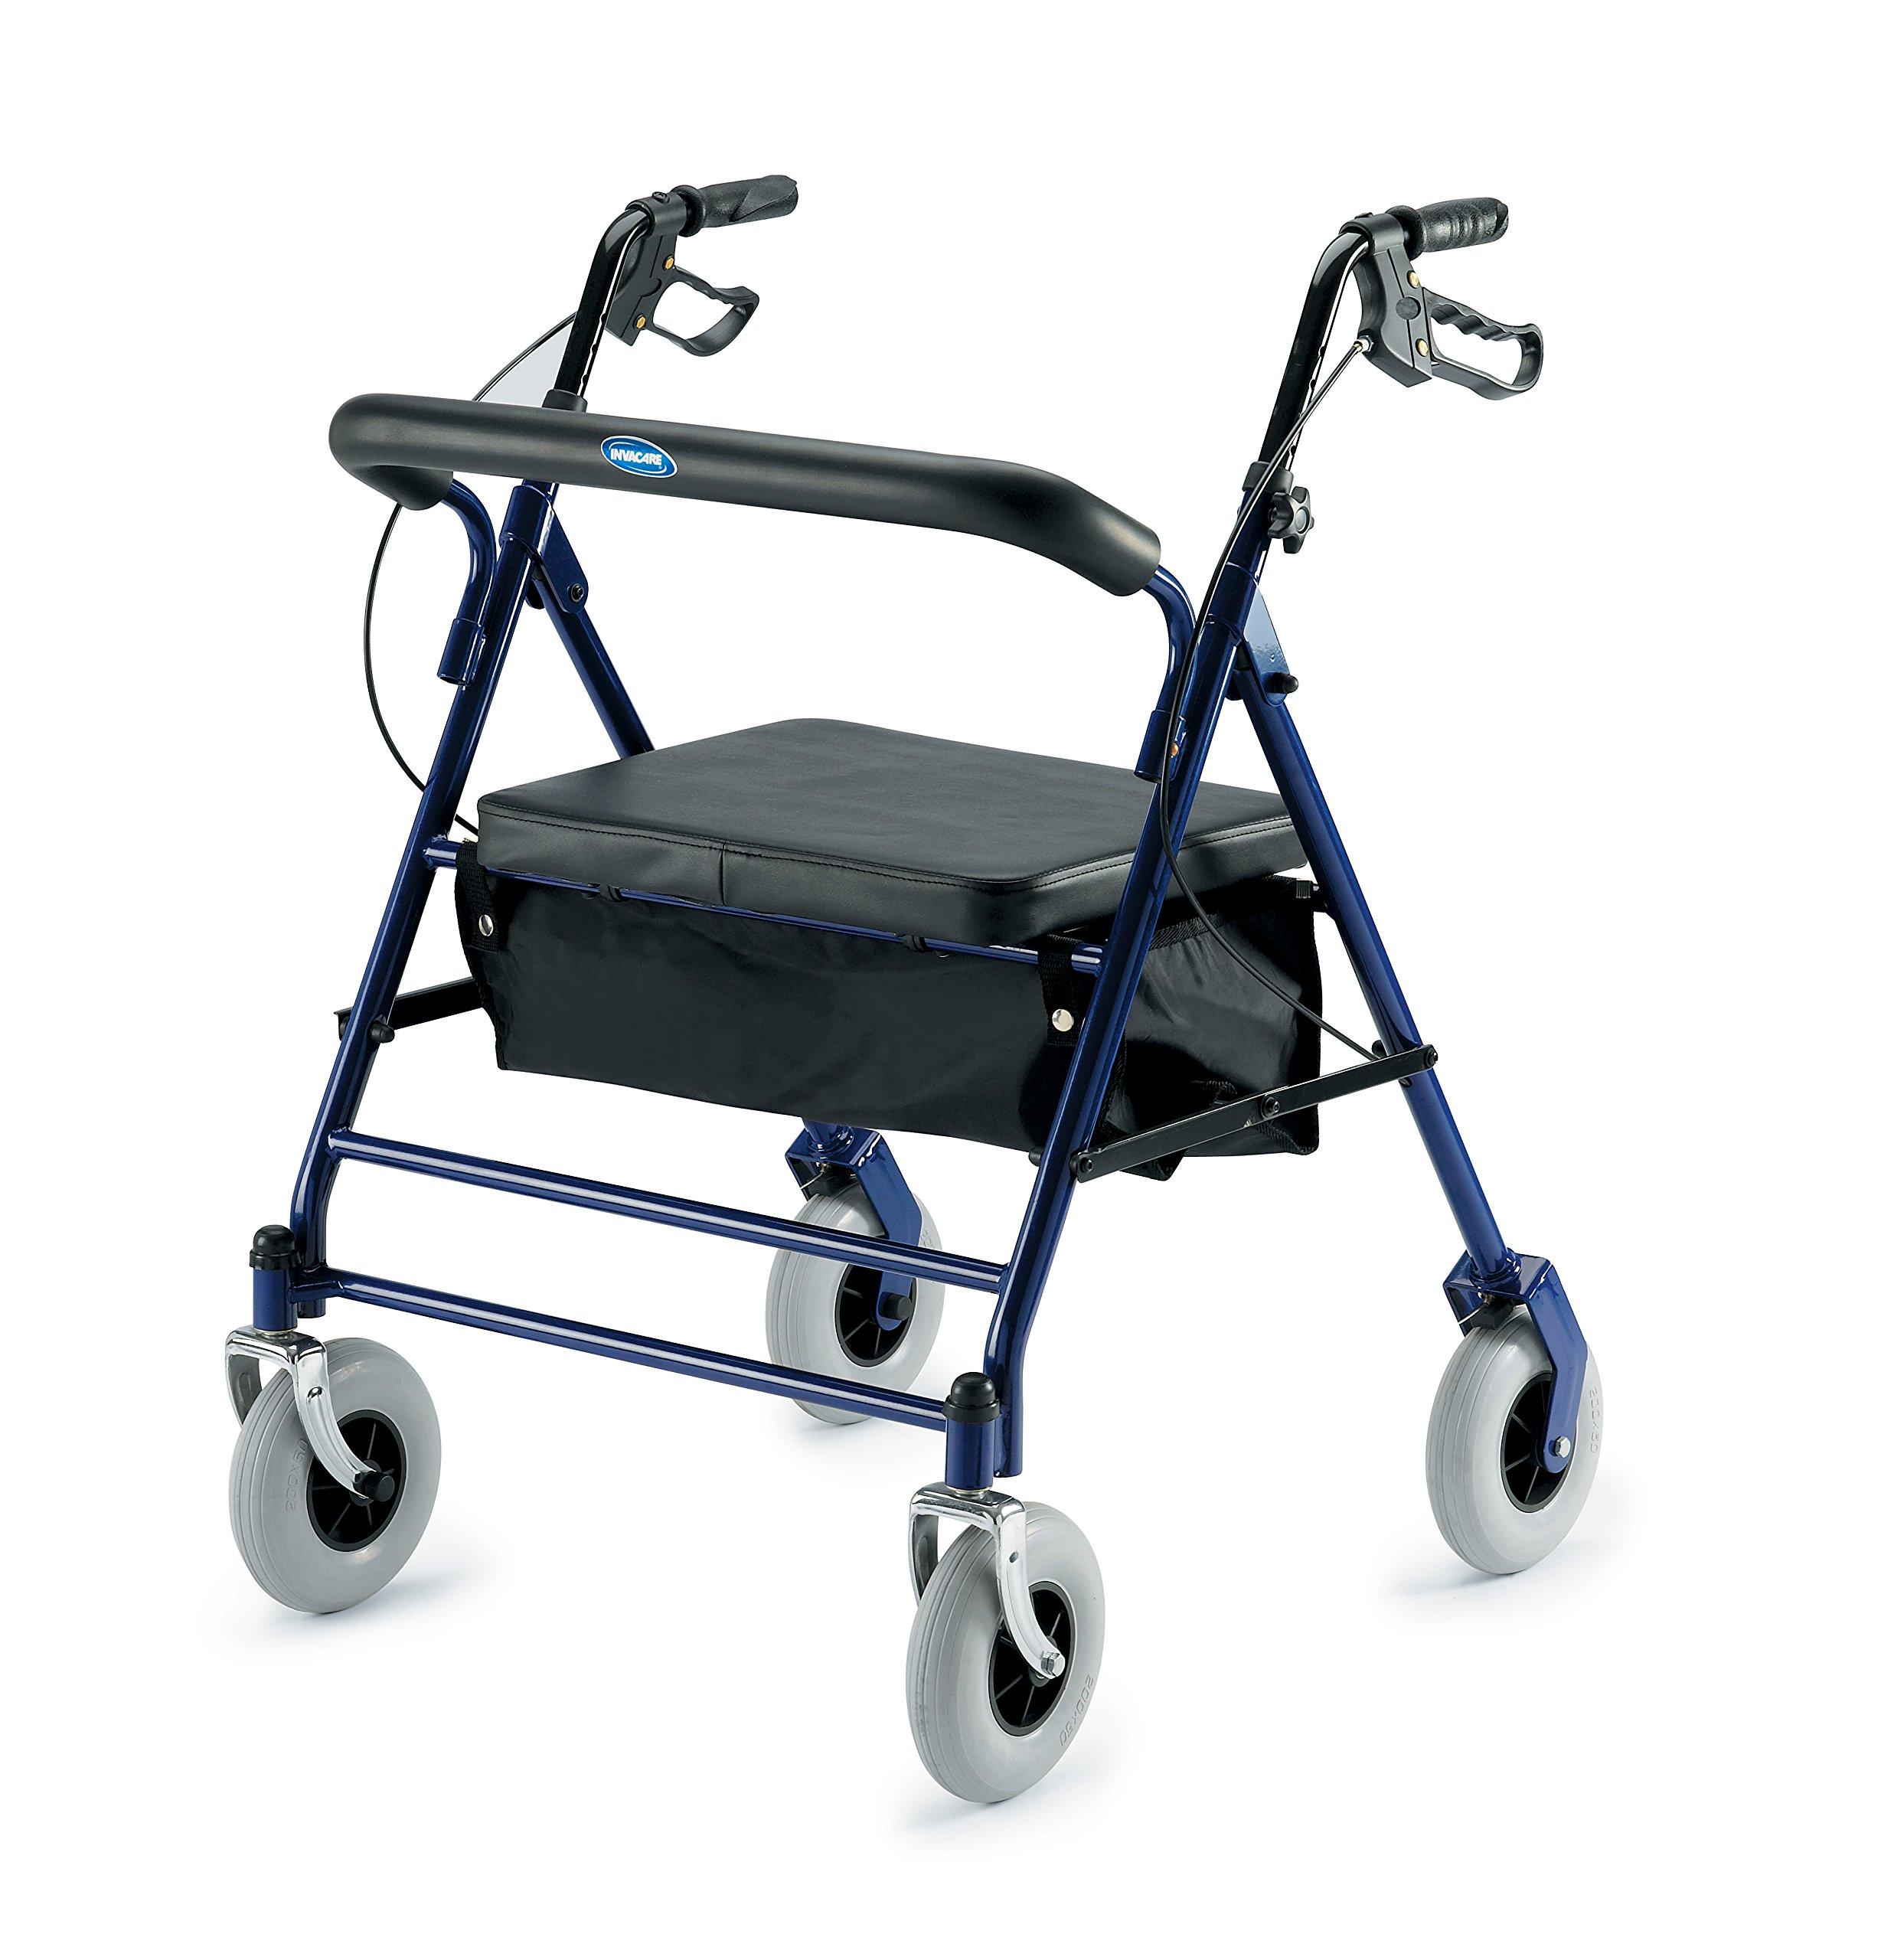 Invacare 66550 Bariatric Rollator 500lb Capacity Flip-Up Padded Seat